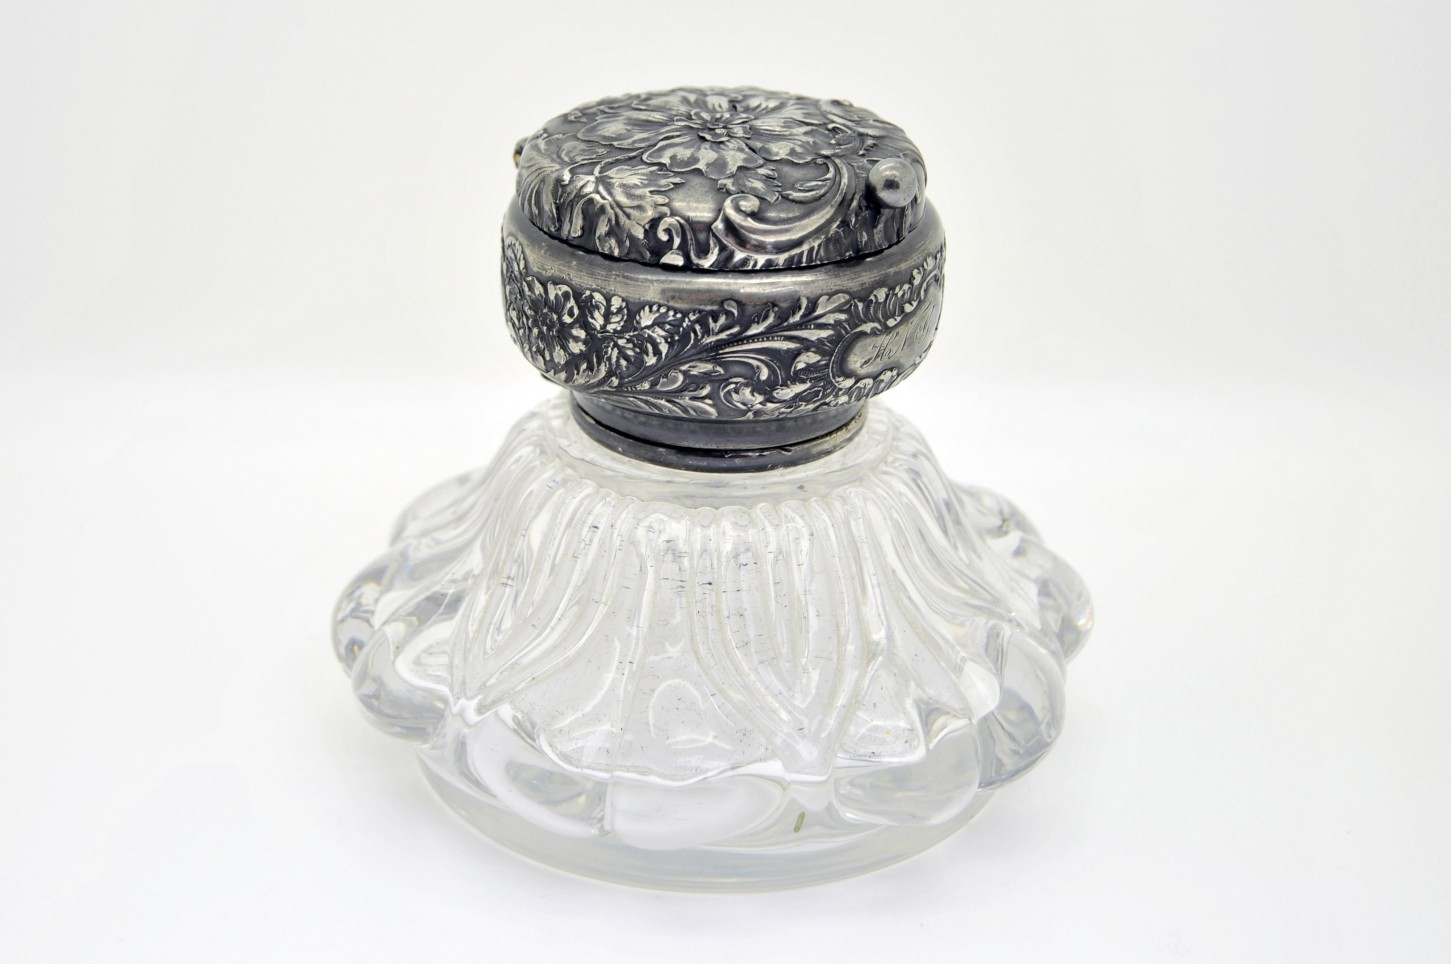 Encrier de style Victorien de fabrication anglaise de 1880.